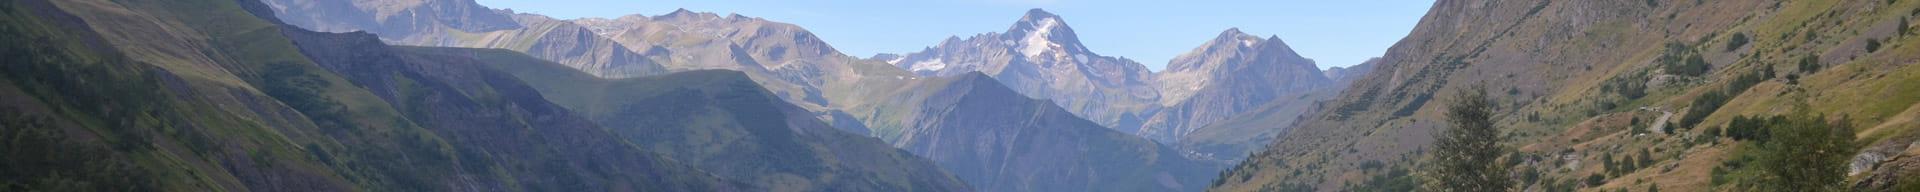 view of Colorado mountain peaks